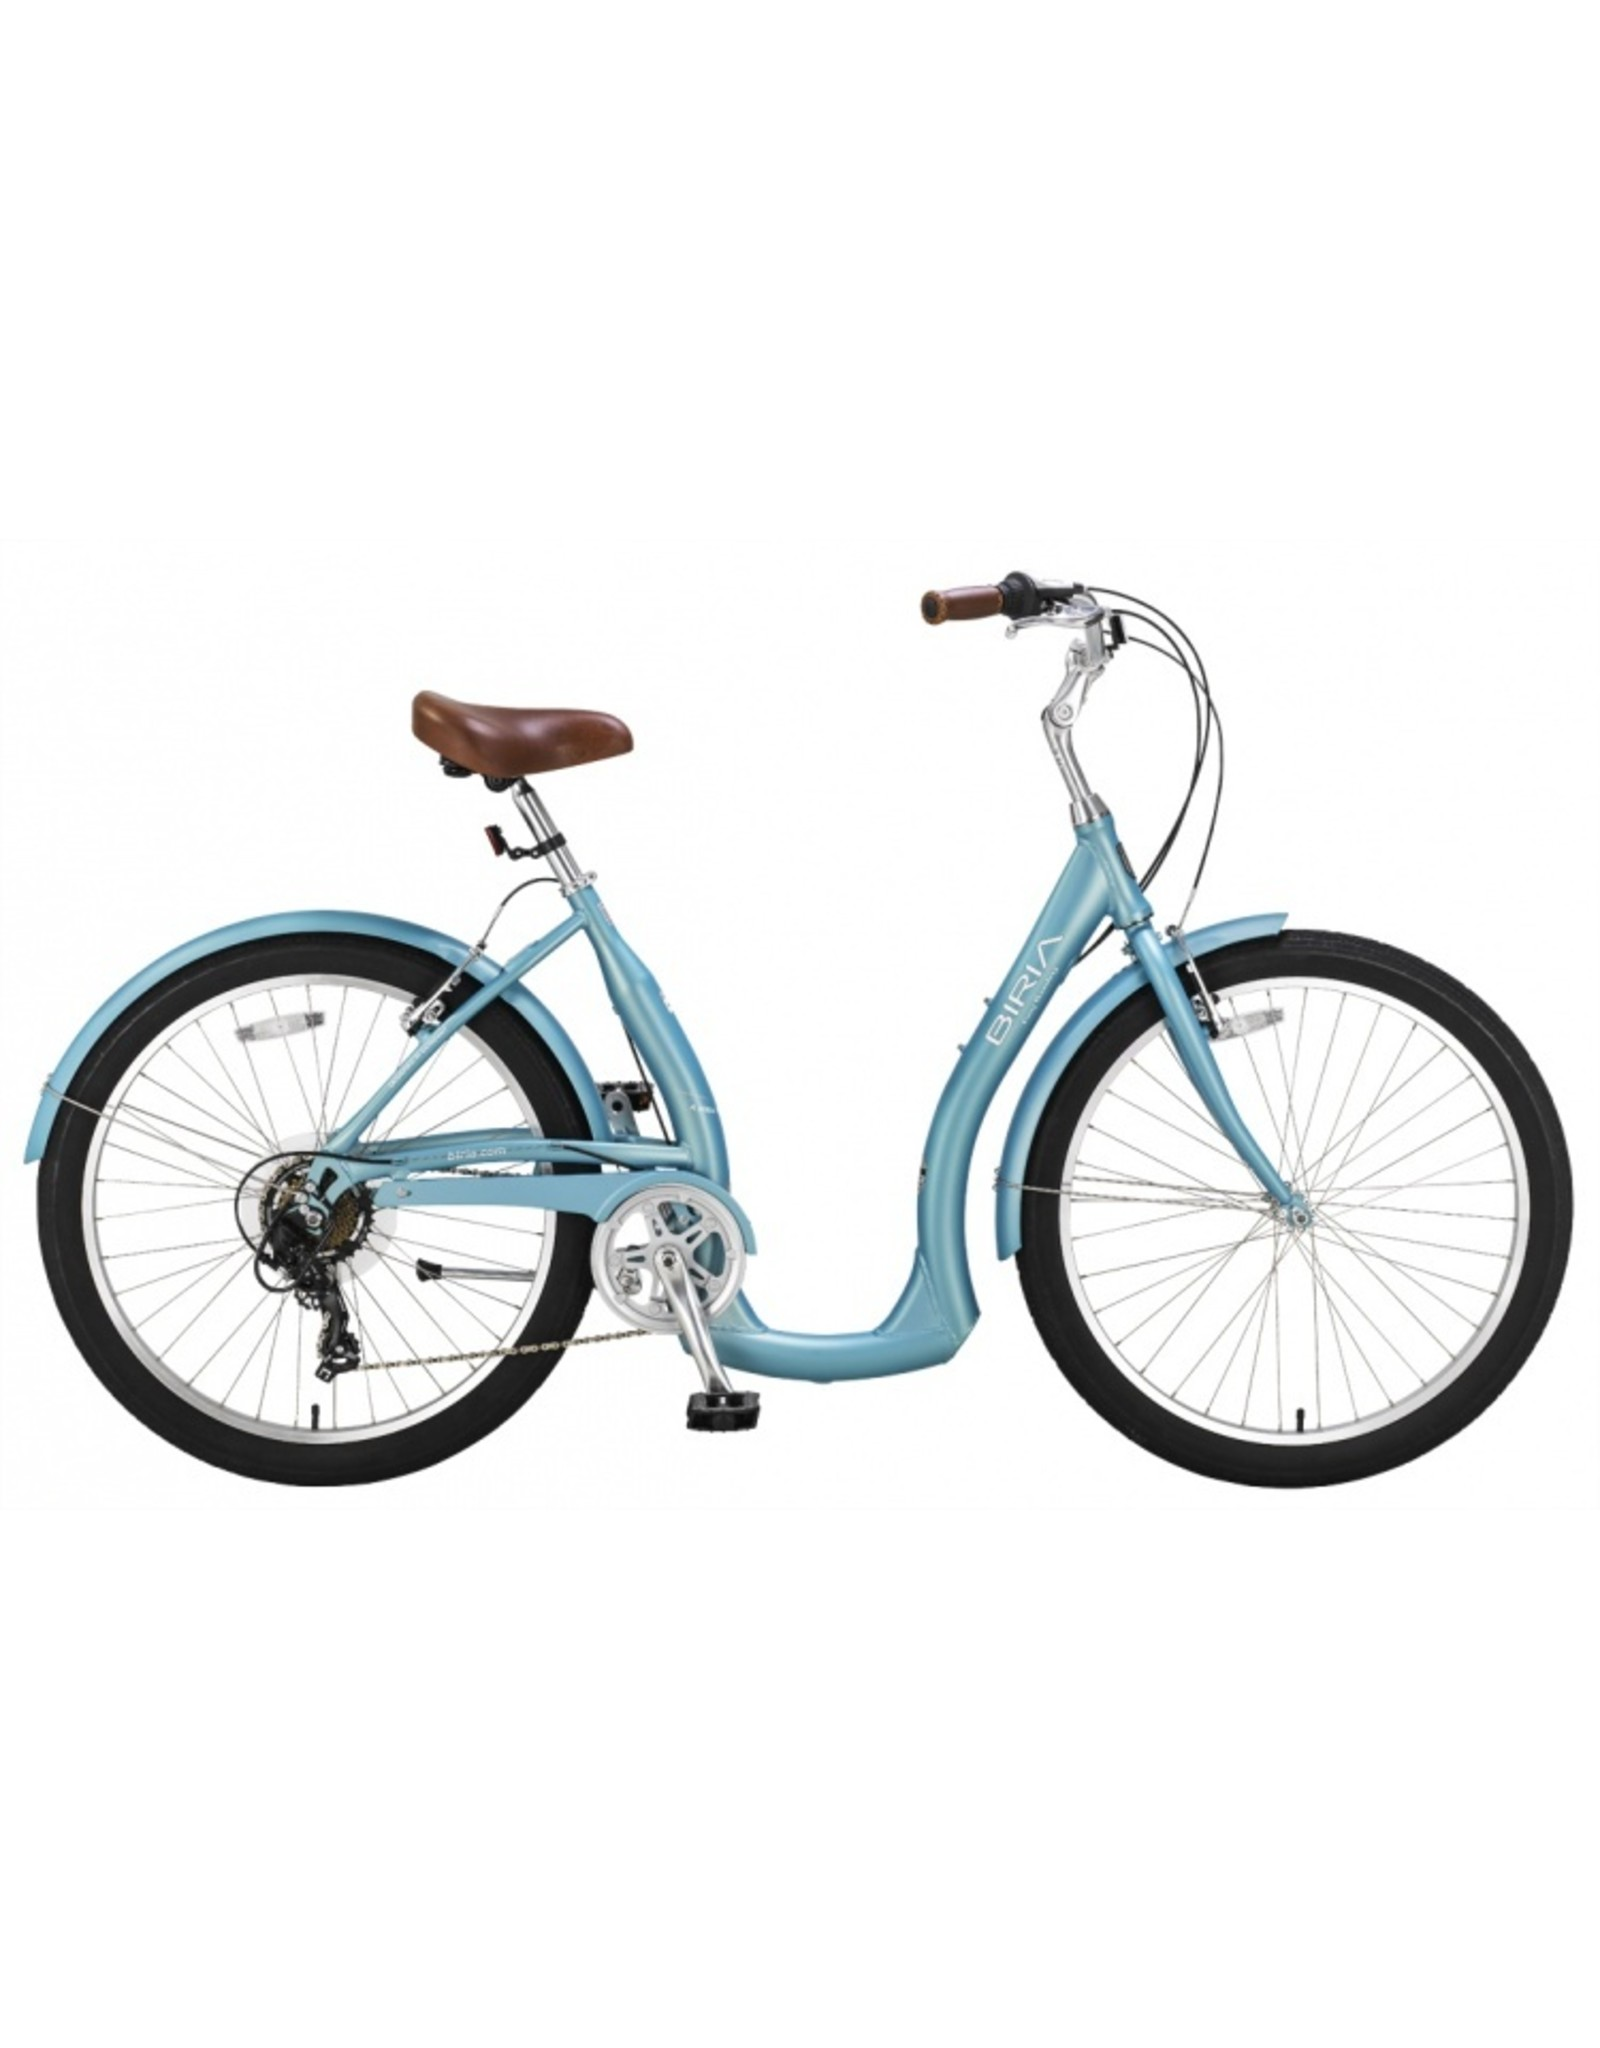 Biria Bikes Easy boarding Easy 7, 7 speed Derailleur, 15, Aqua Green